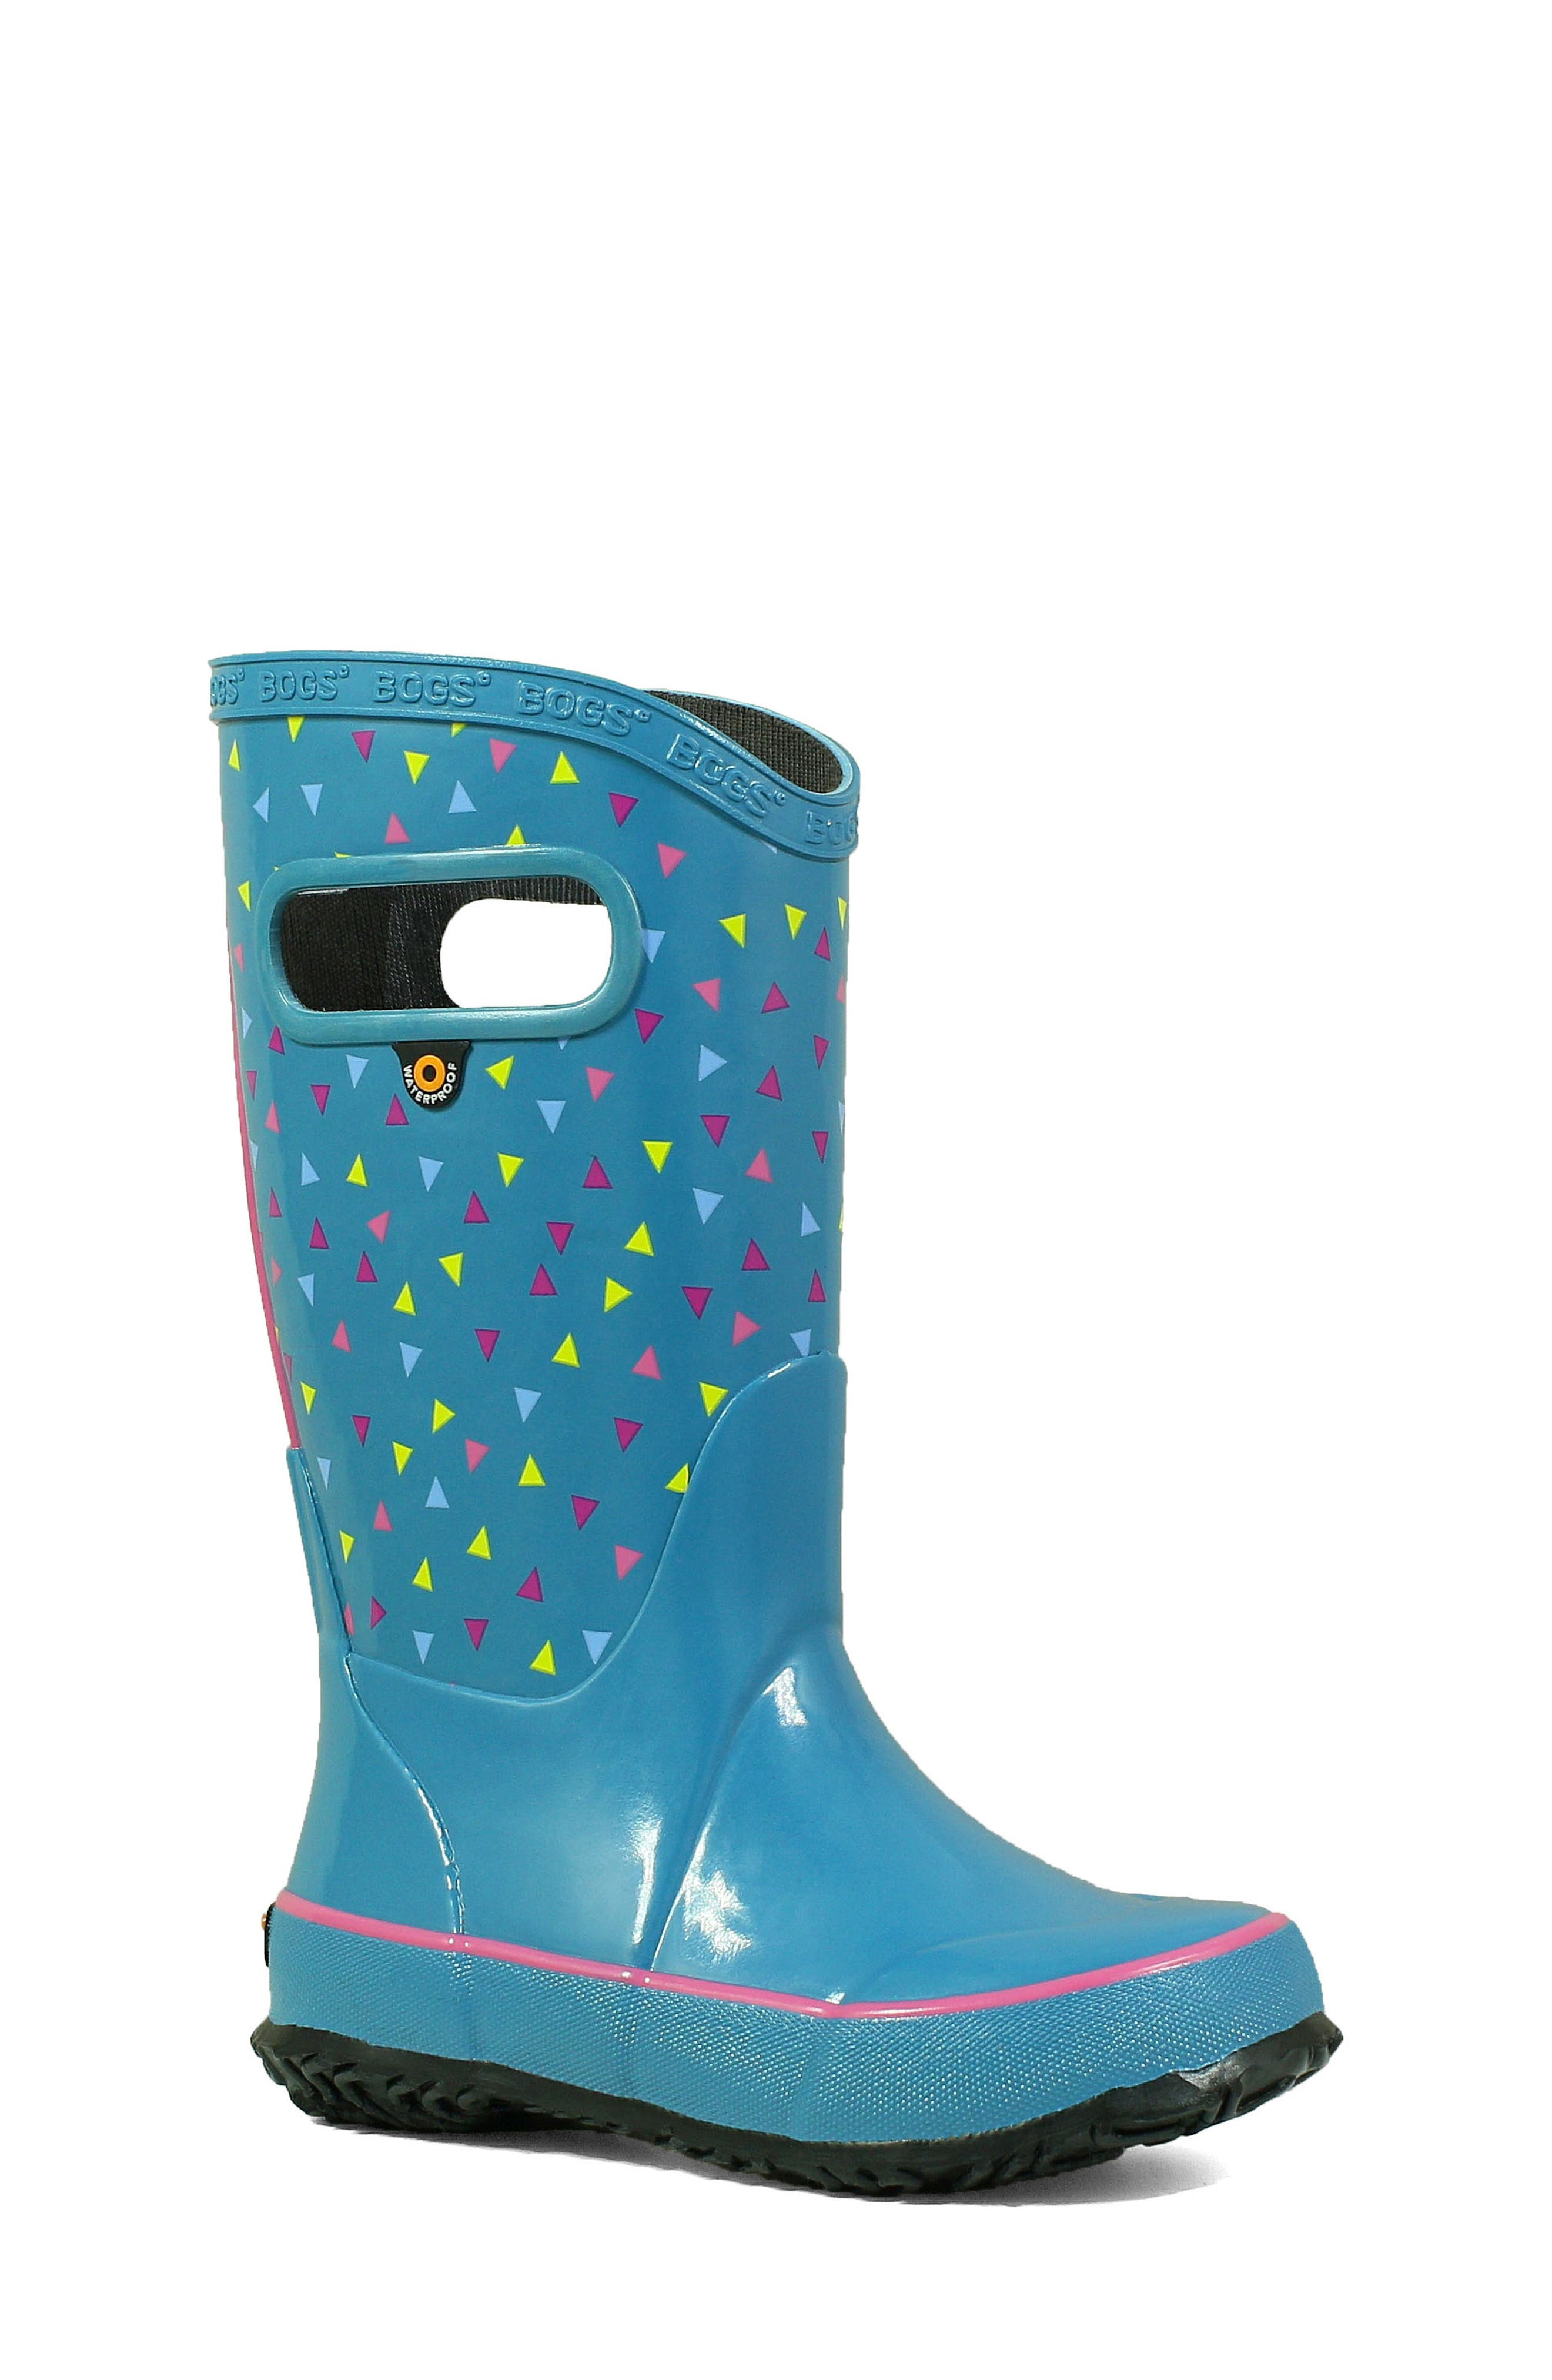 BOGS Dots Waterproof Rain Boot, Main, color, DARK BLUE MULTI